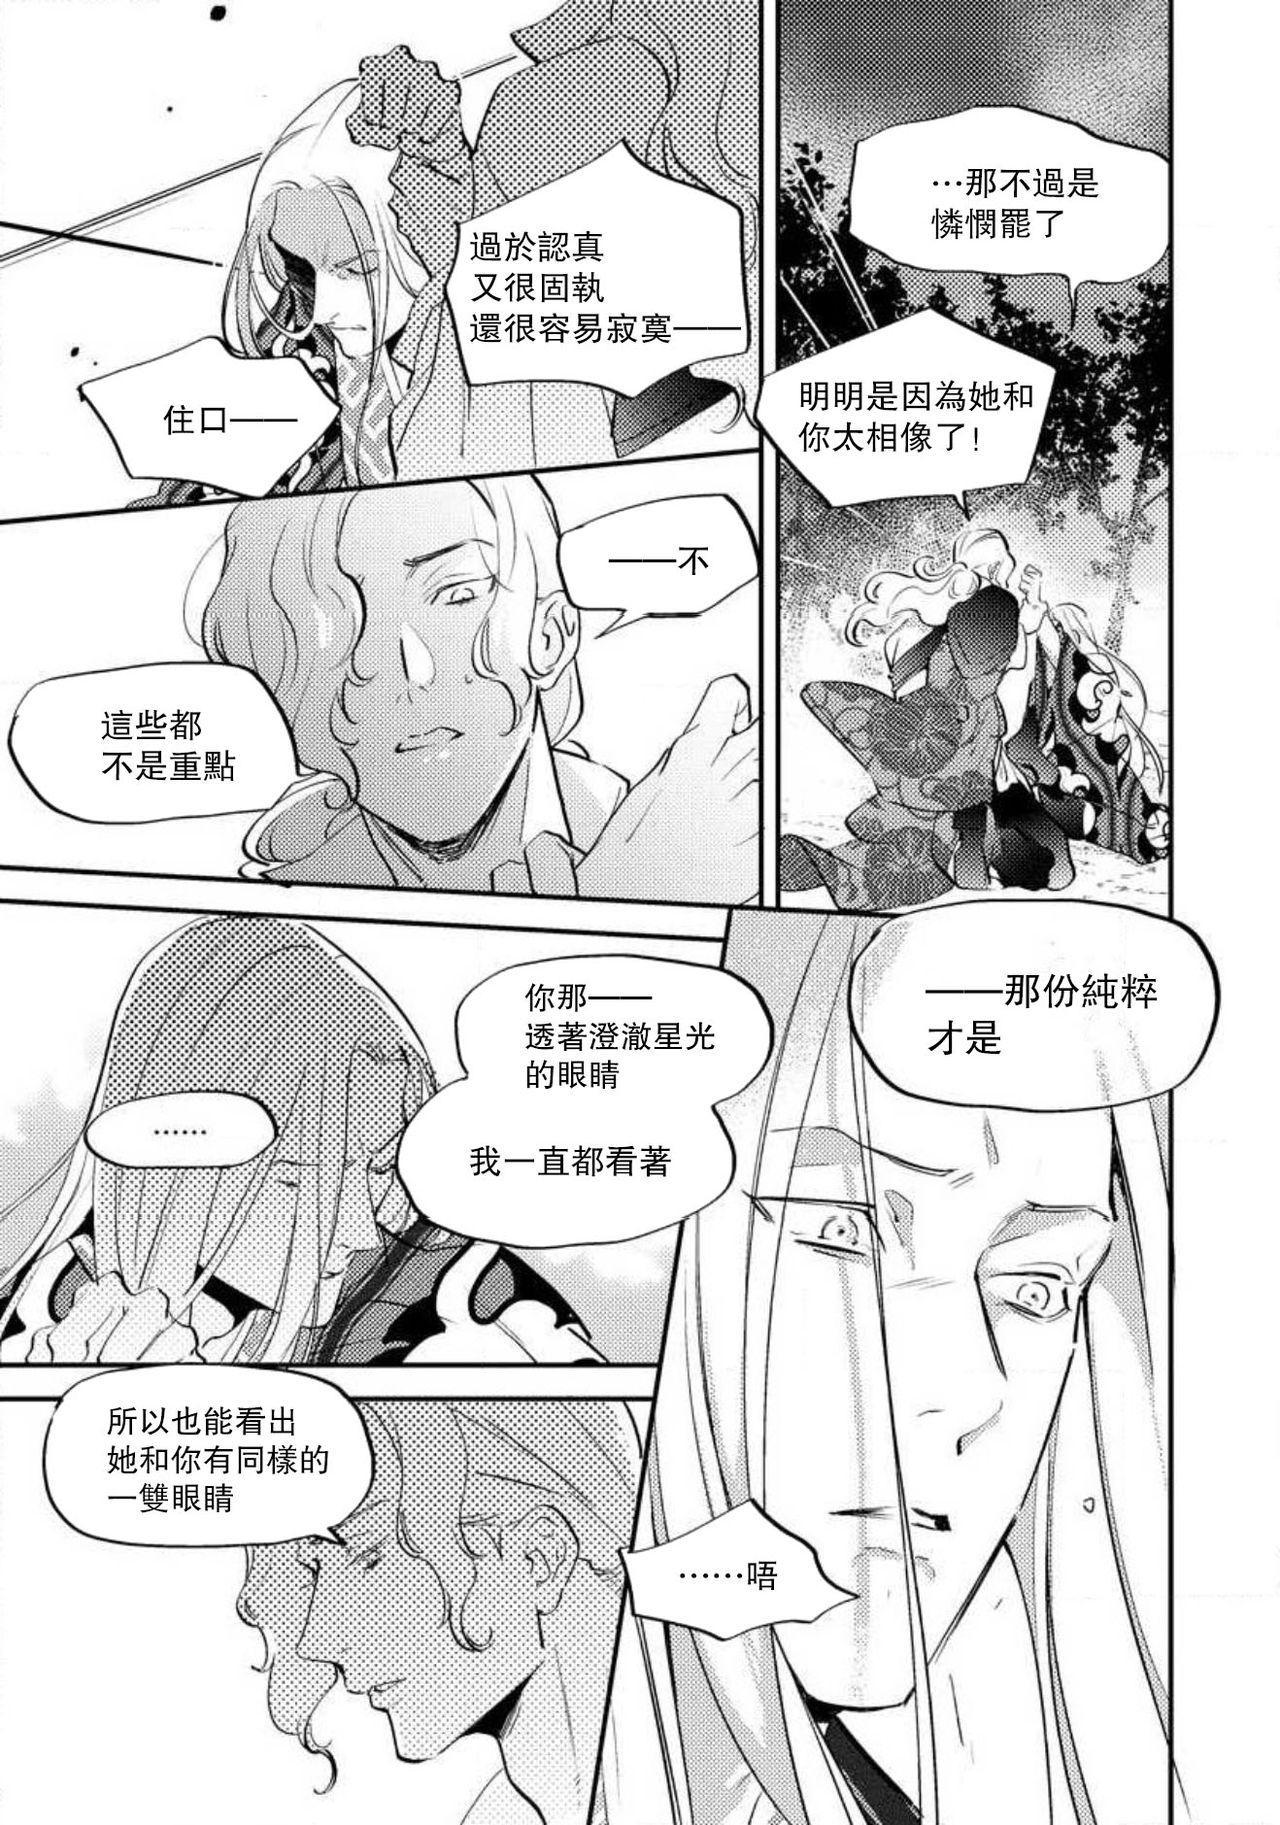 Oeyama suimutan utsukushiki oni no toraware hime | 大江山醉夢逸話 美麗的鬼與被囚禁的公主 Ch. 1-8 160